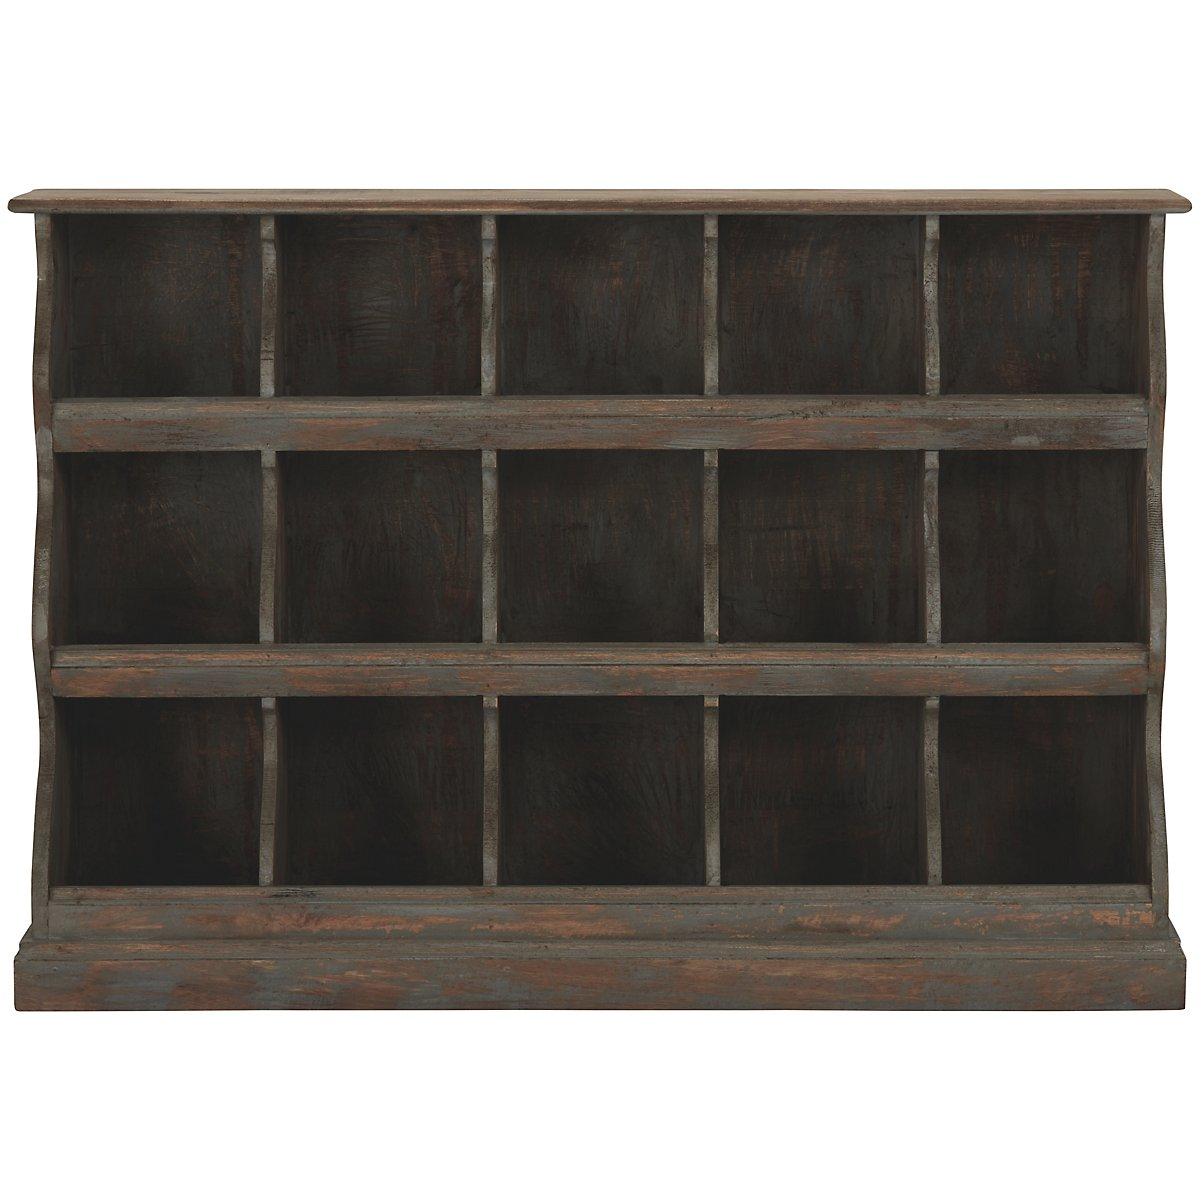 Drina Wood Wall Shelf